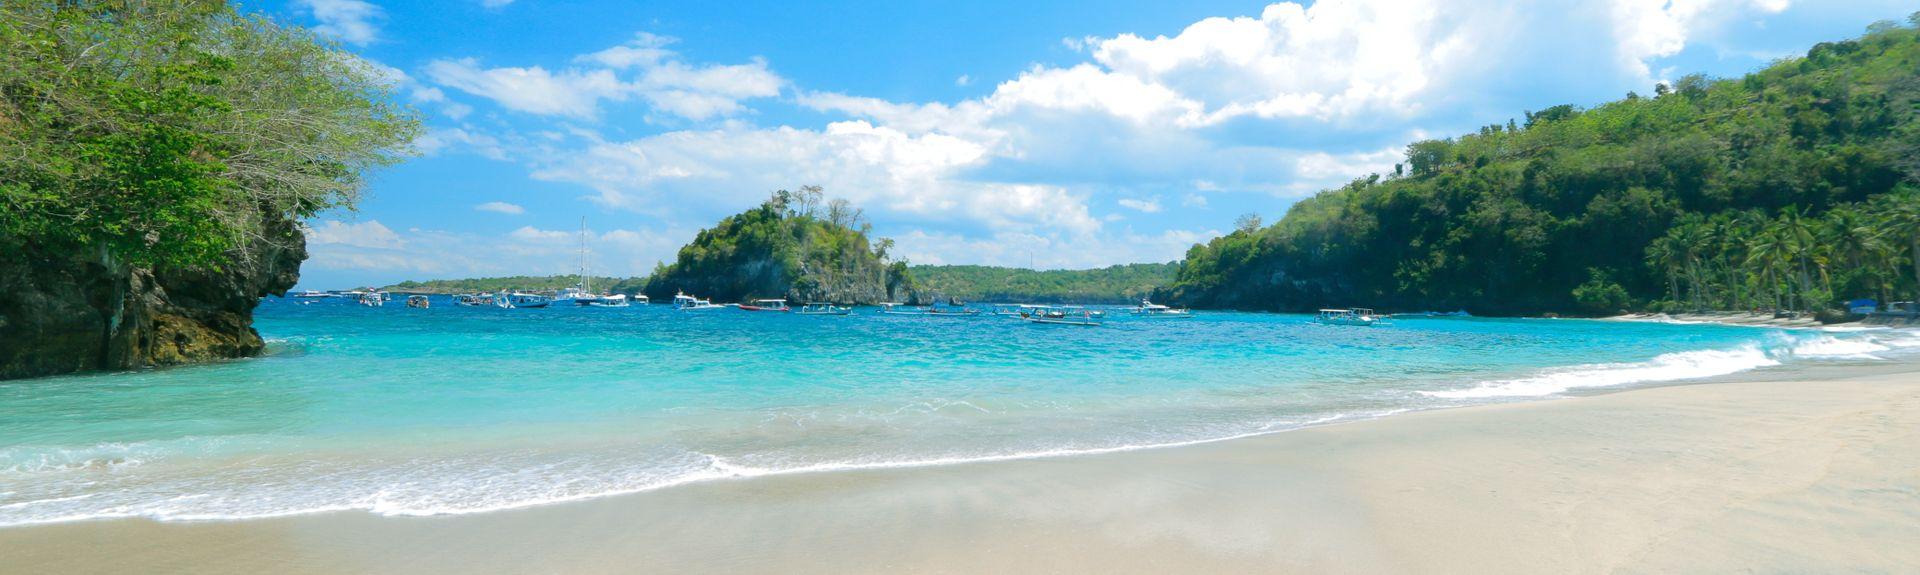 Nusa Lembongan Beach, Lembongan Island, Bali, Indonesia